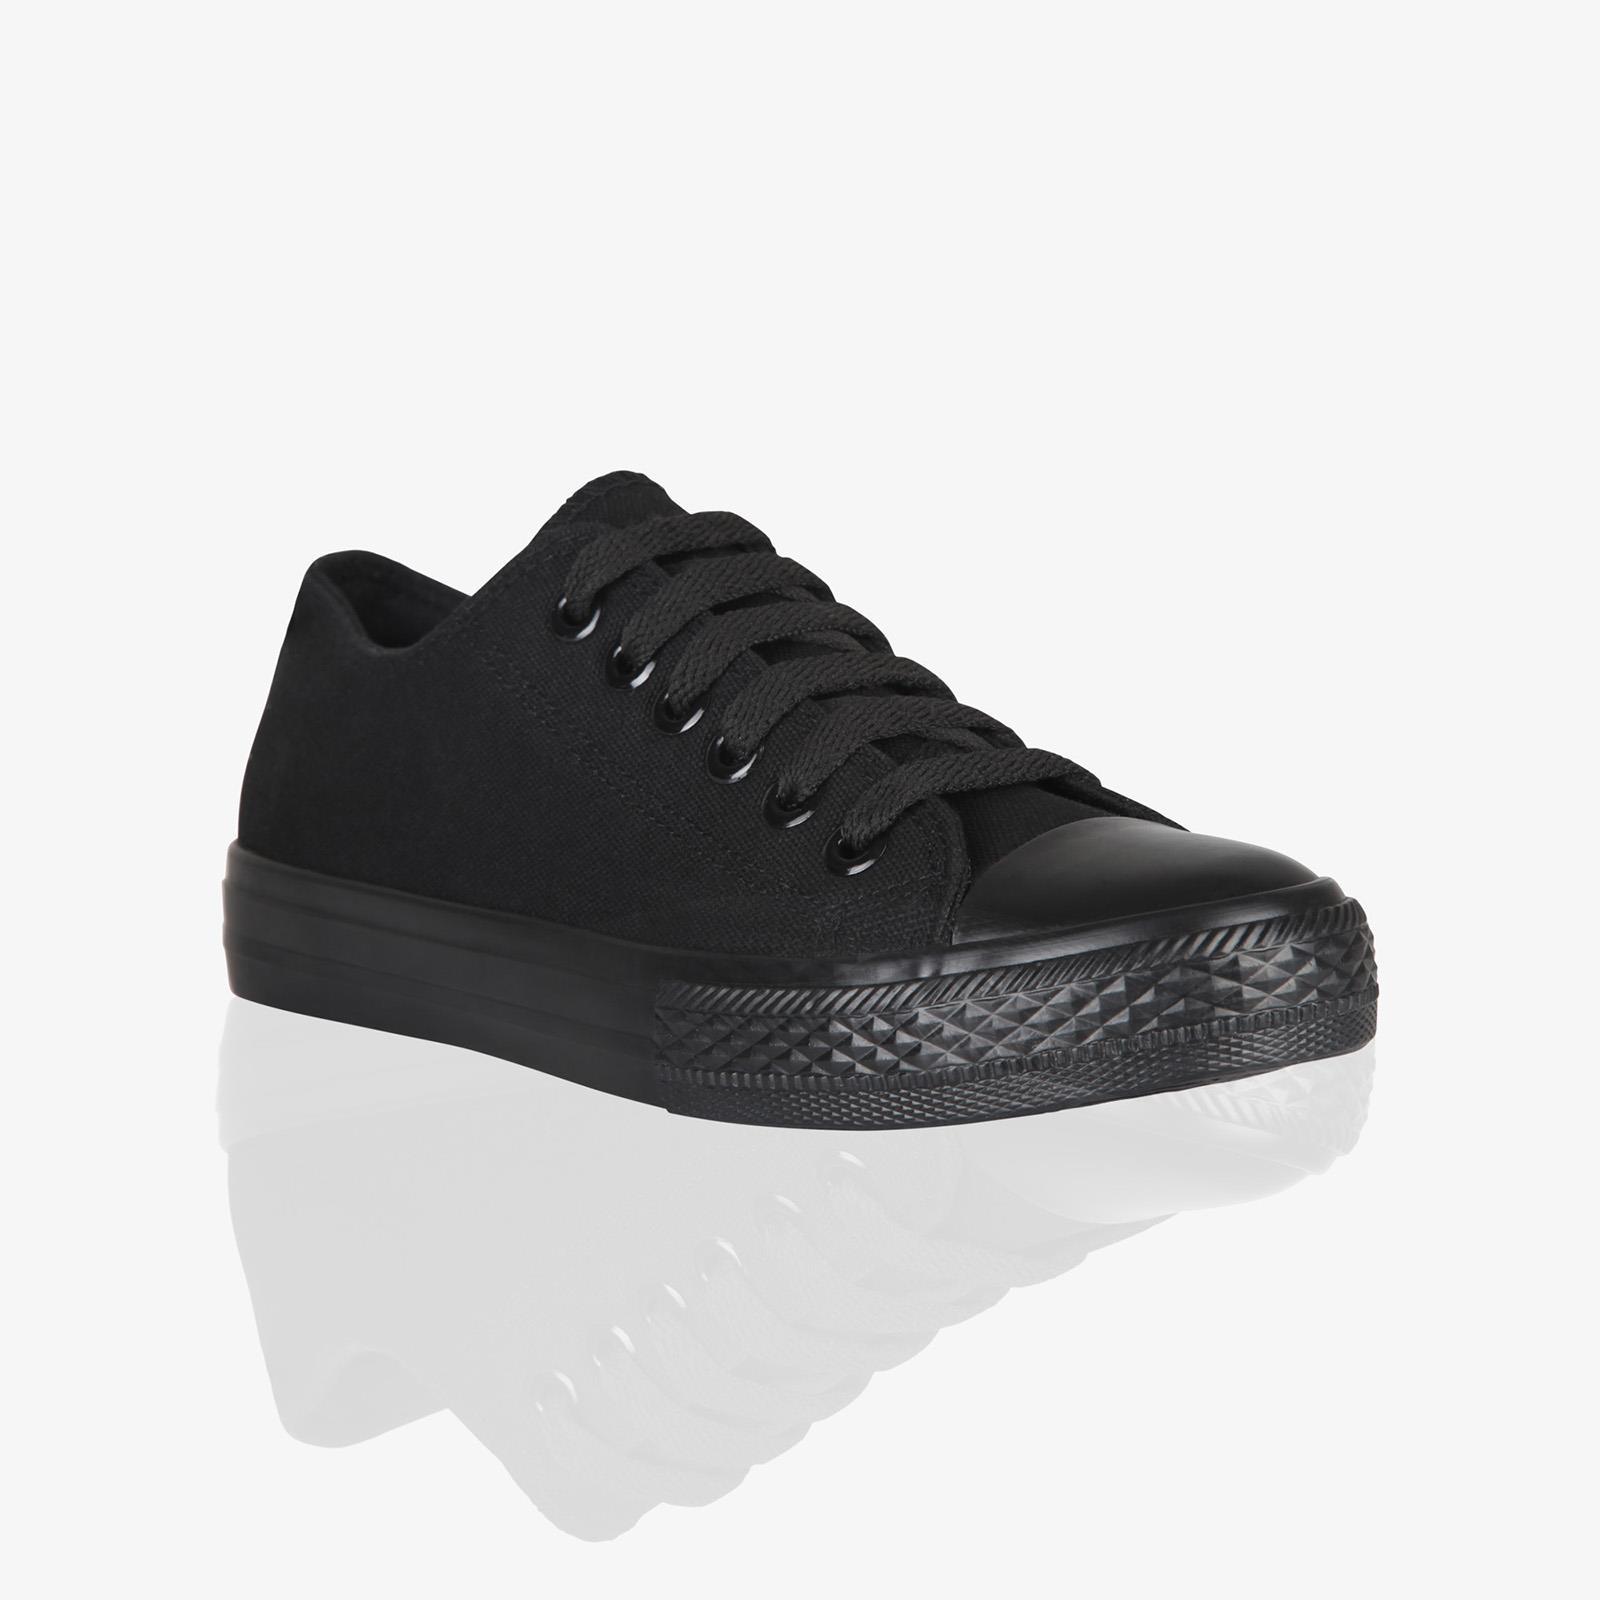 Zapatillas-Mujer-Casuales-Deportiva-Barata-Lona-Moda-Originales-Outlet-Tela-Moda miniatura 28